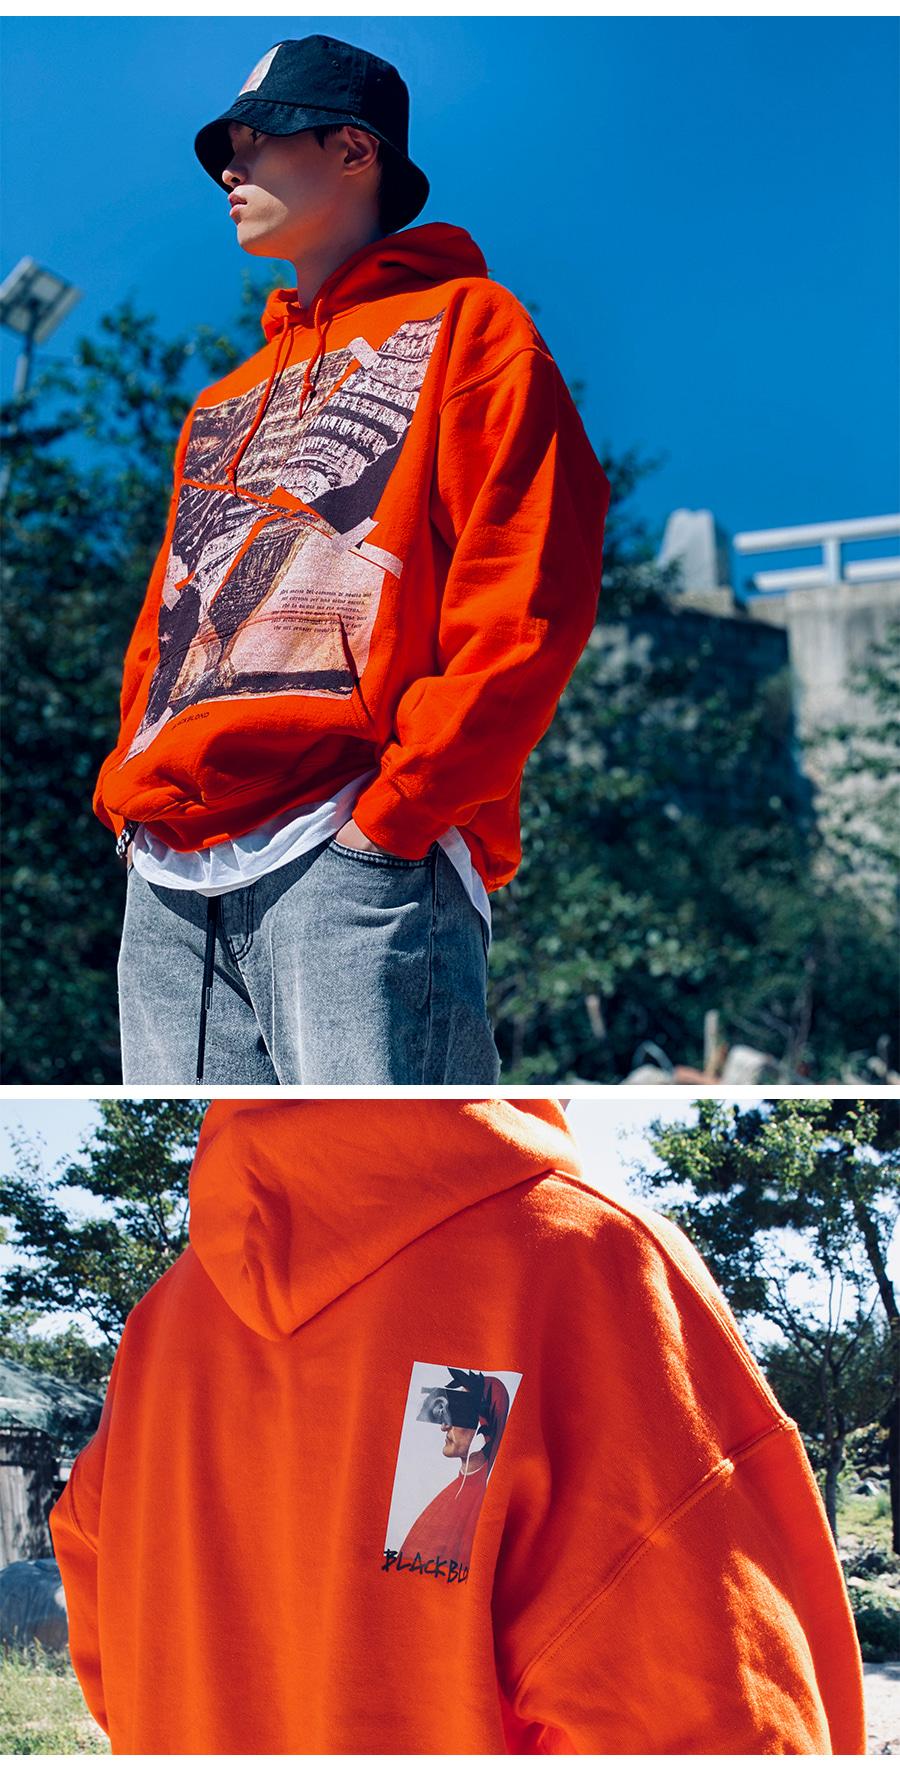 BLACKBLOND - BBD Crushed Era Hoodie (Orange)